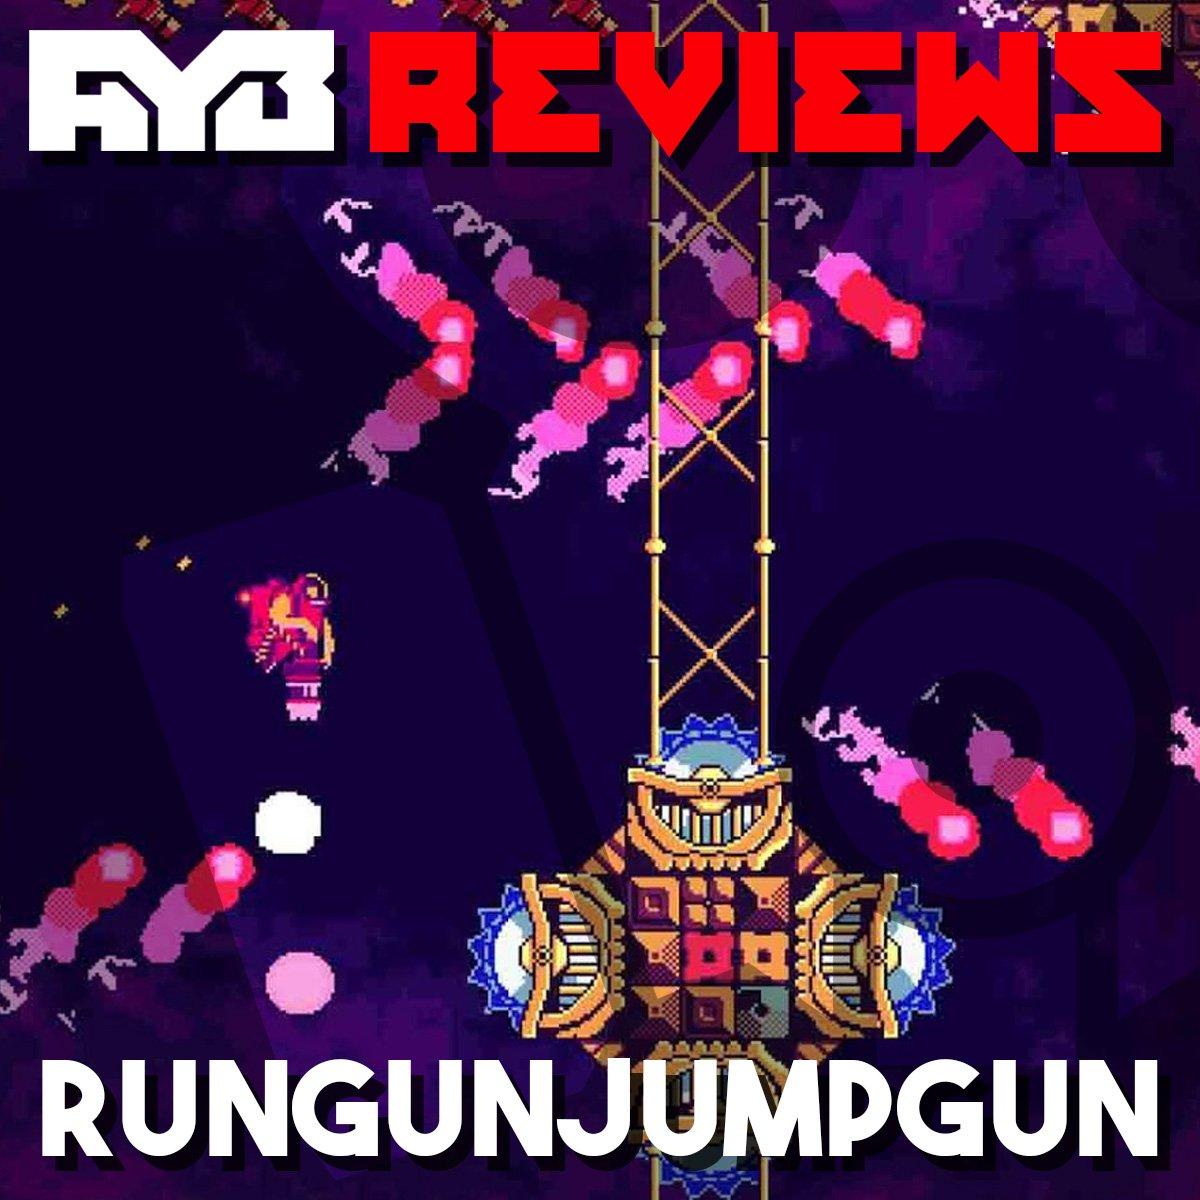 review-feature-rungunjumpgun